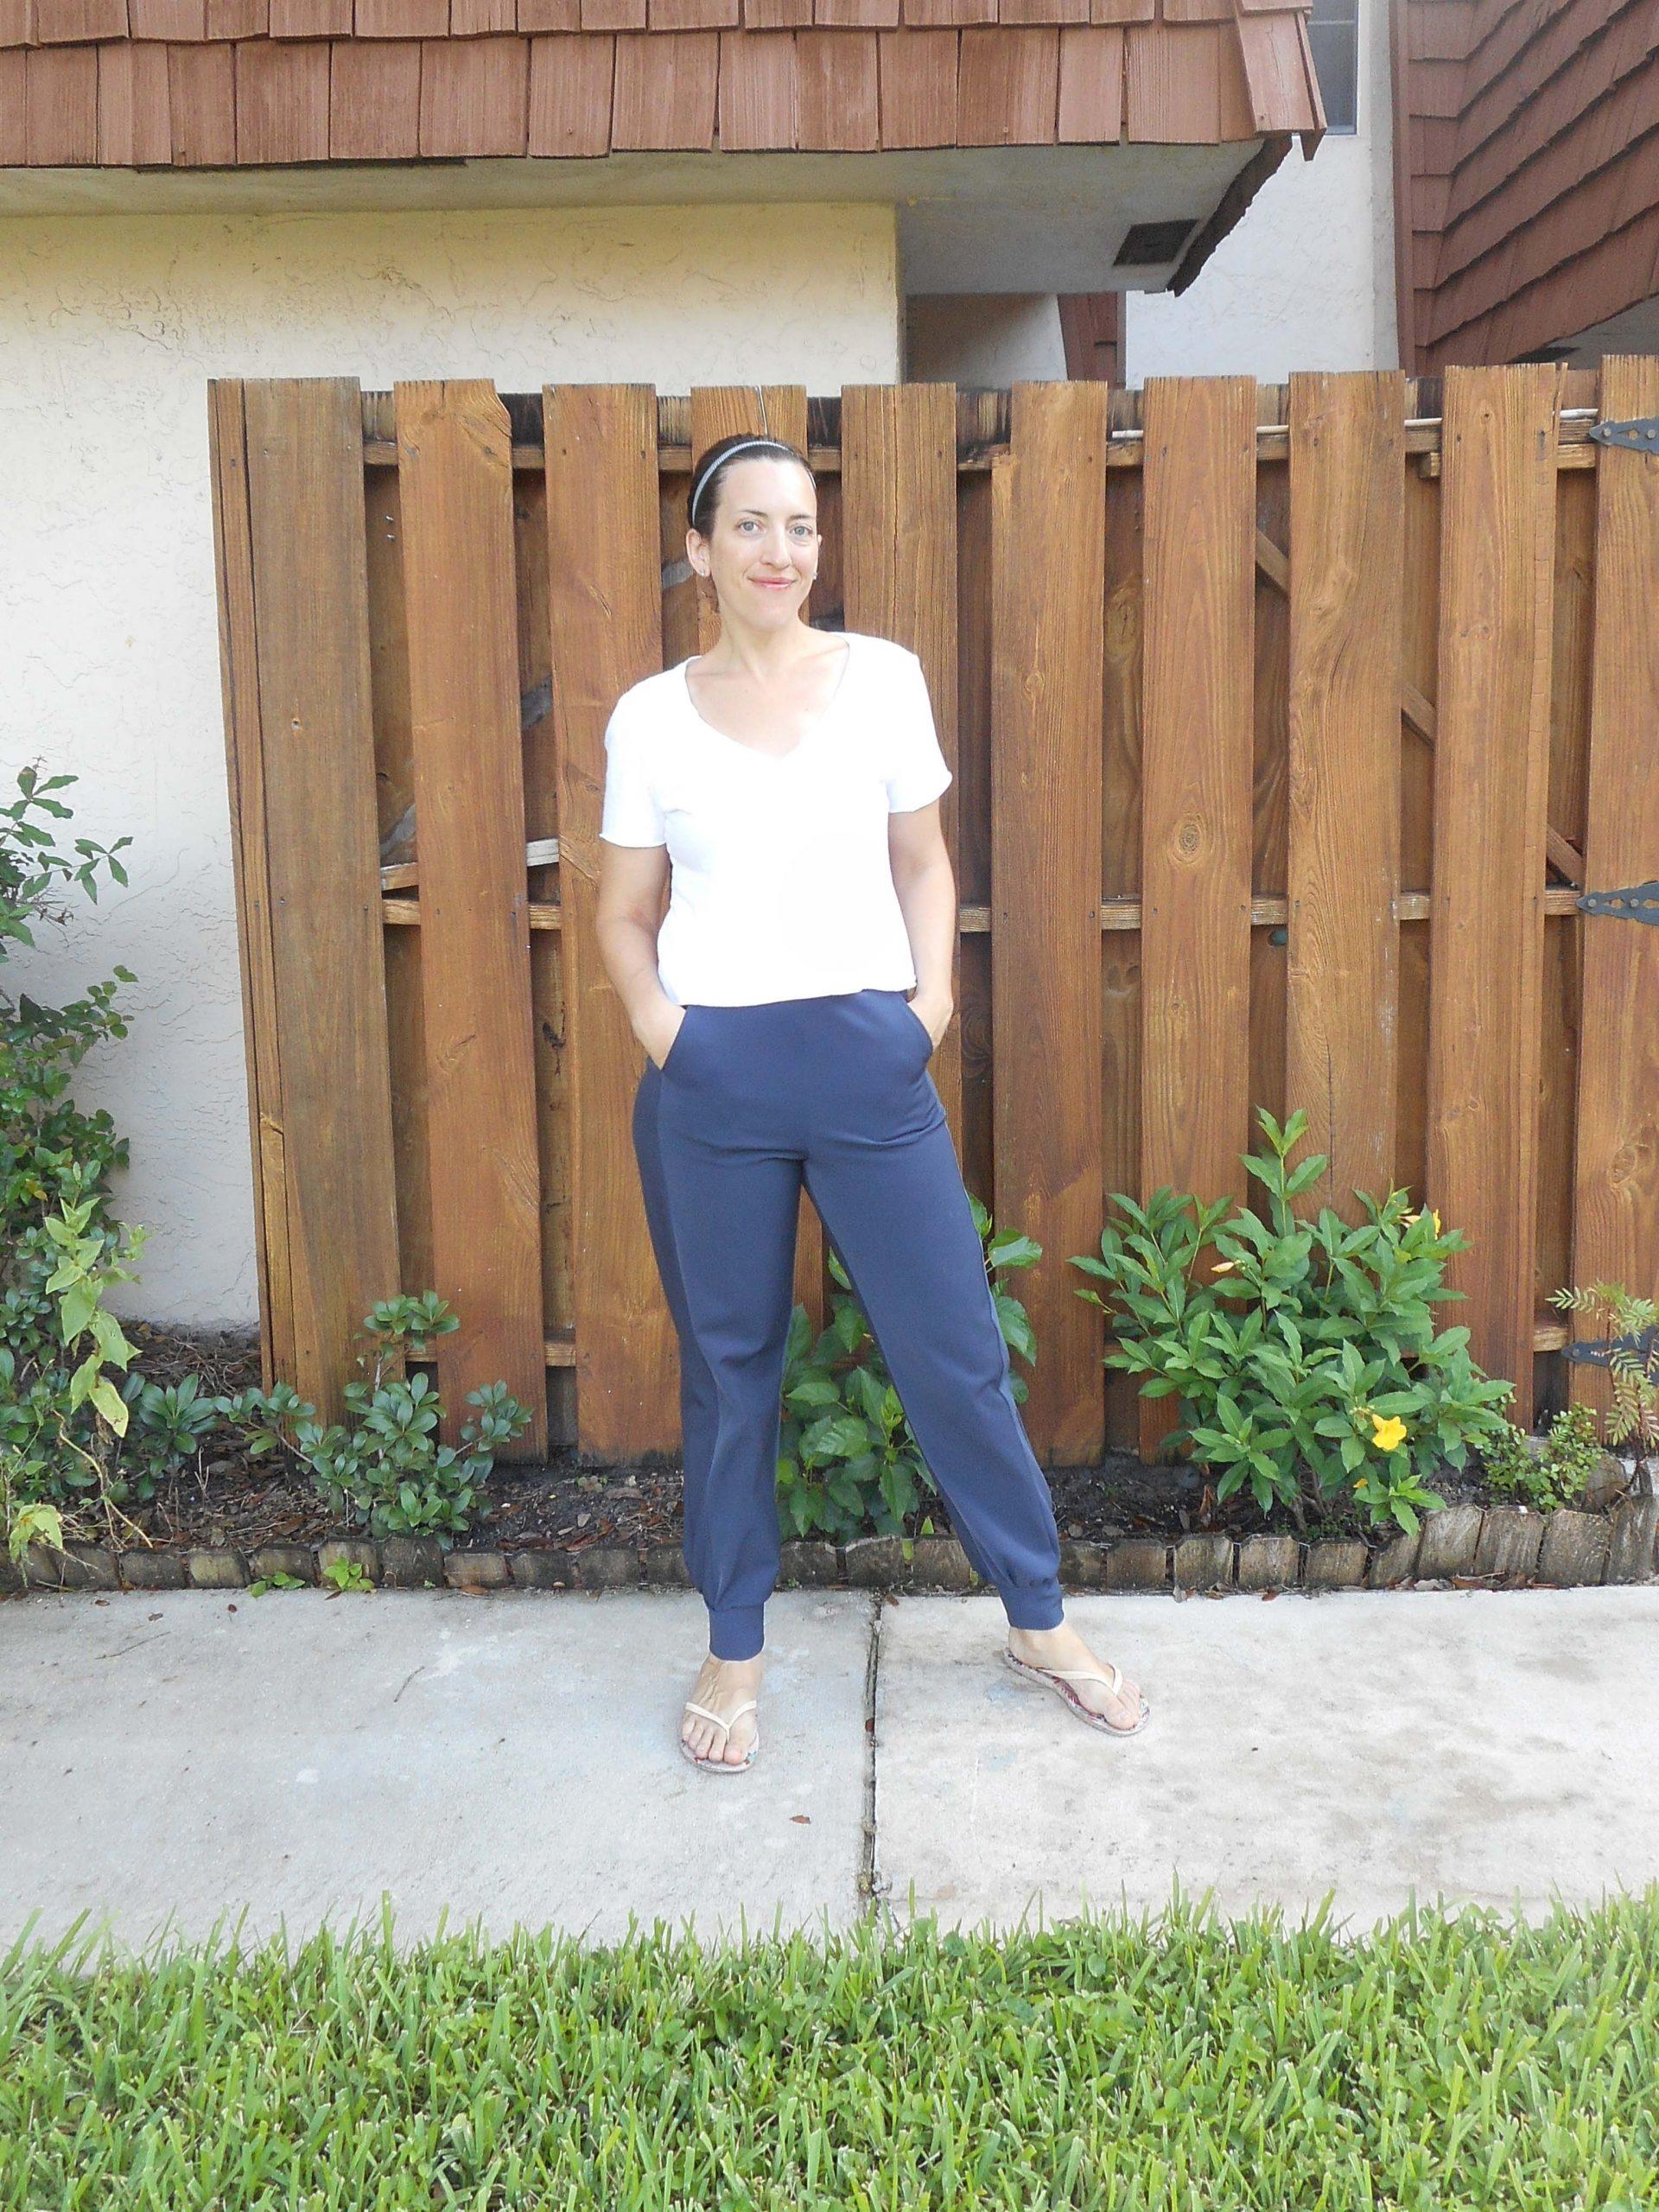 Basics Sewing: Sweatpants and White V-neck Tee